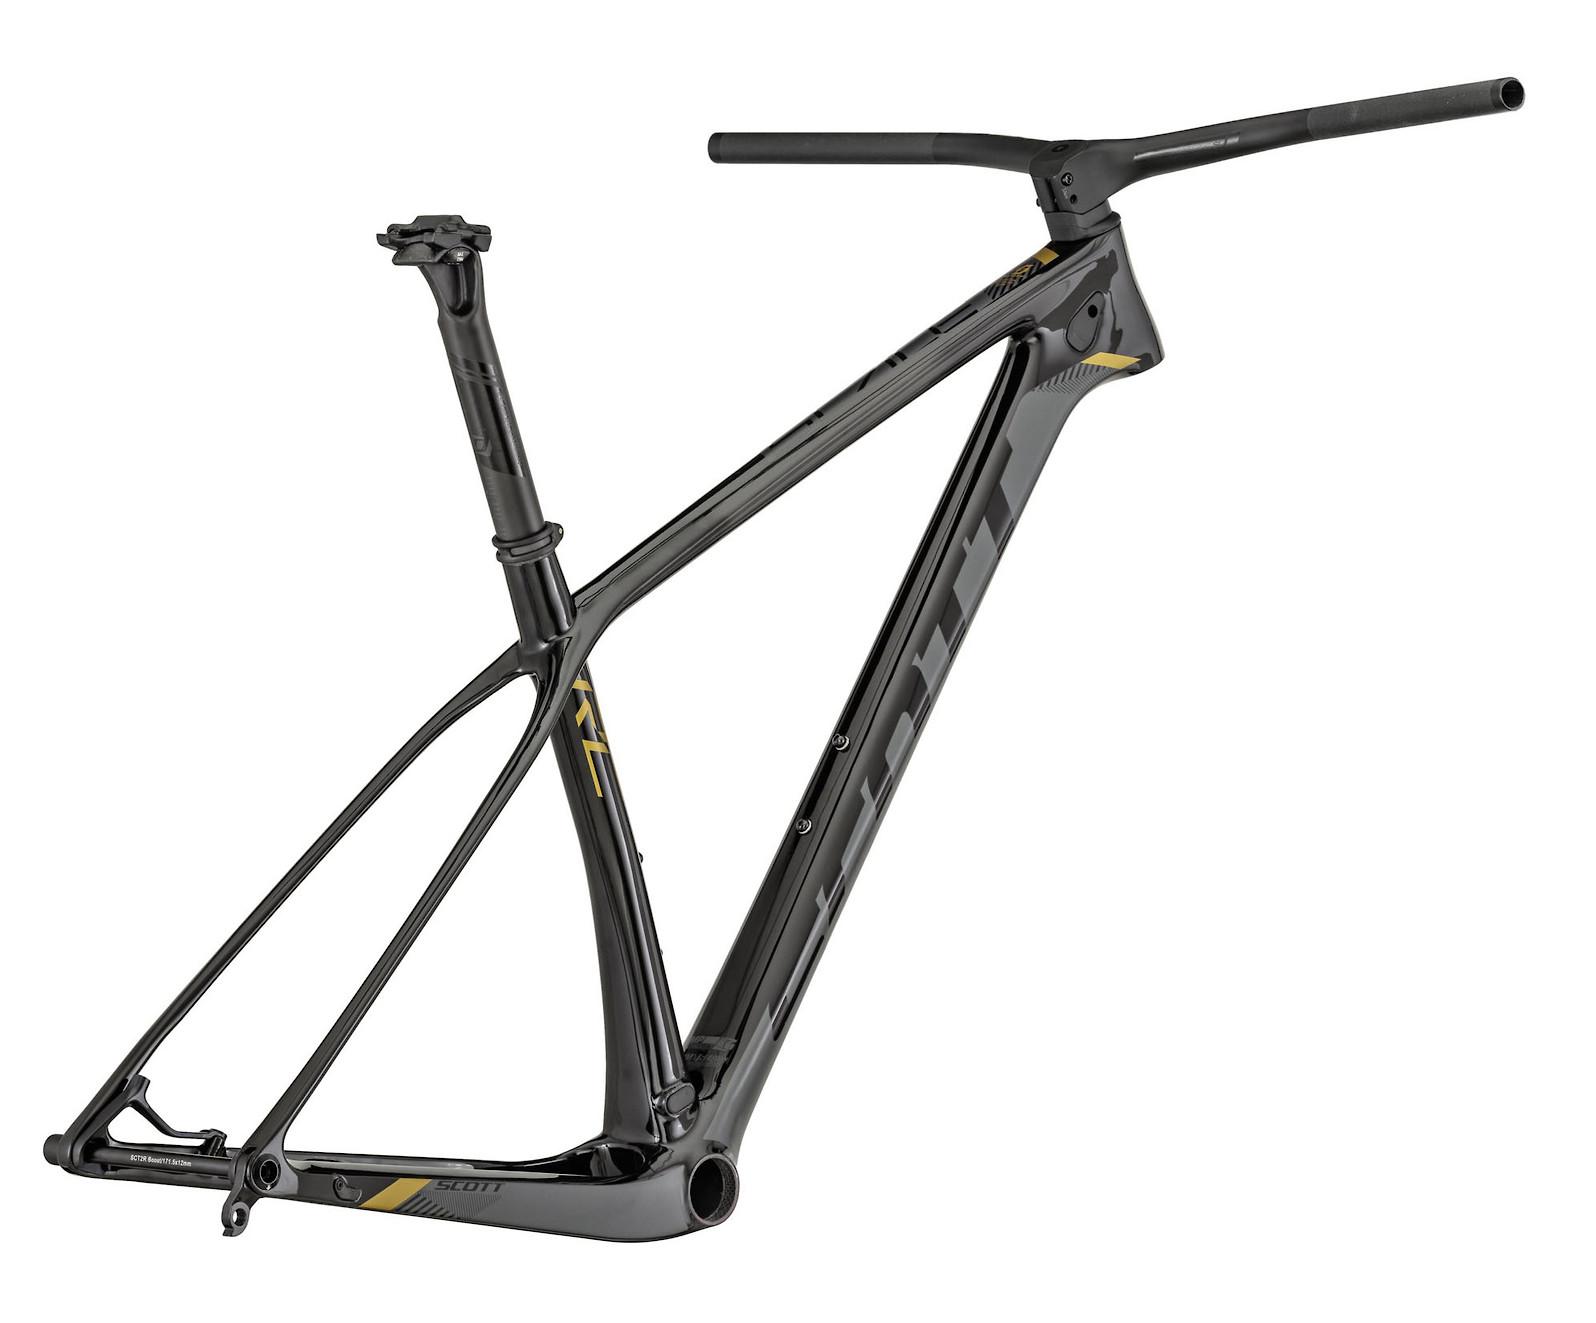 2019 Scott Scale RC 900 SL Frame